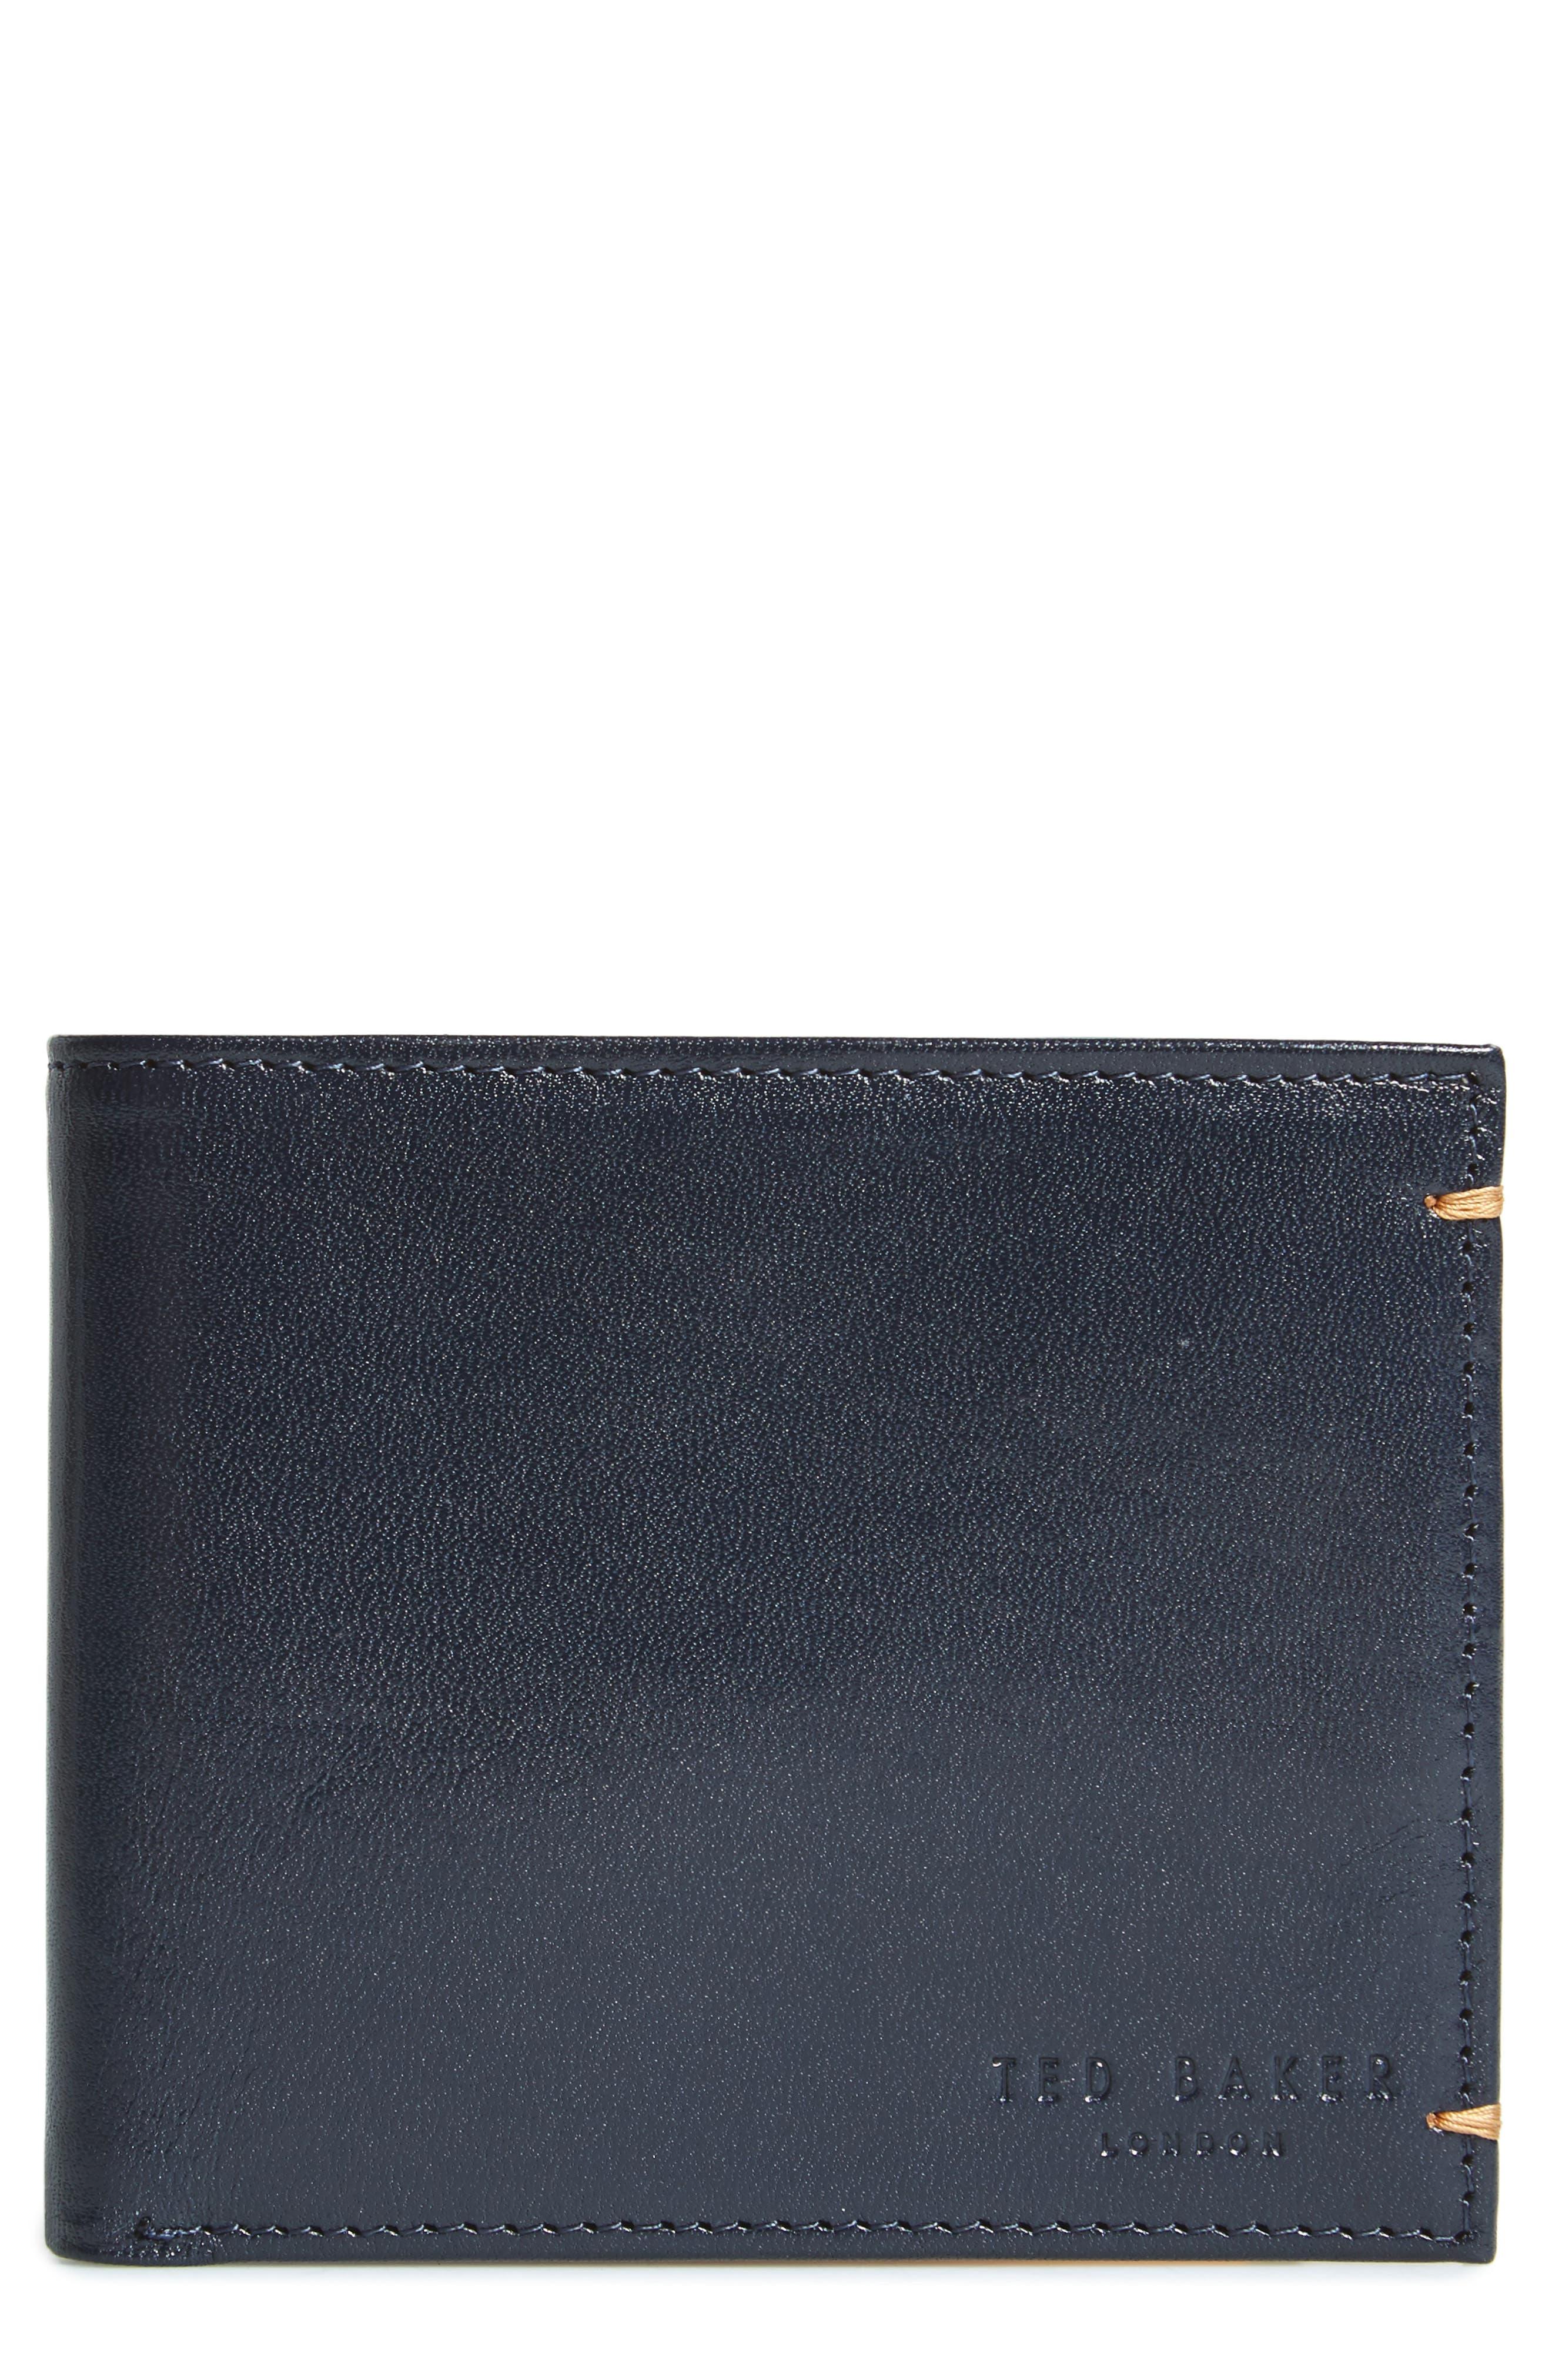 Alternate Image 1 Selected - Ted Baker London Vivid Leather Wallet